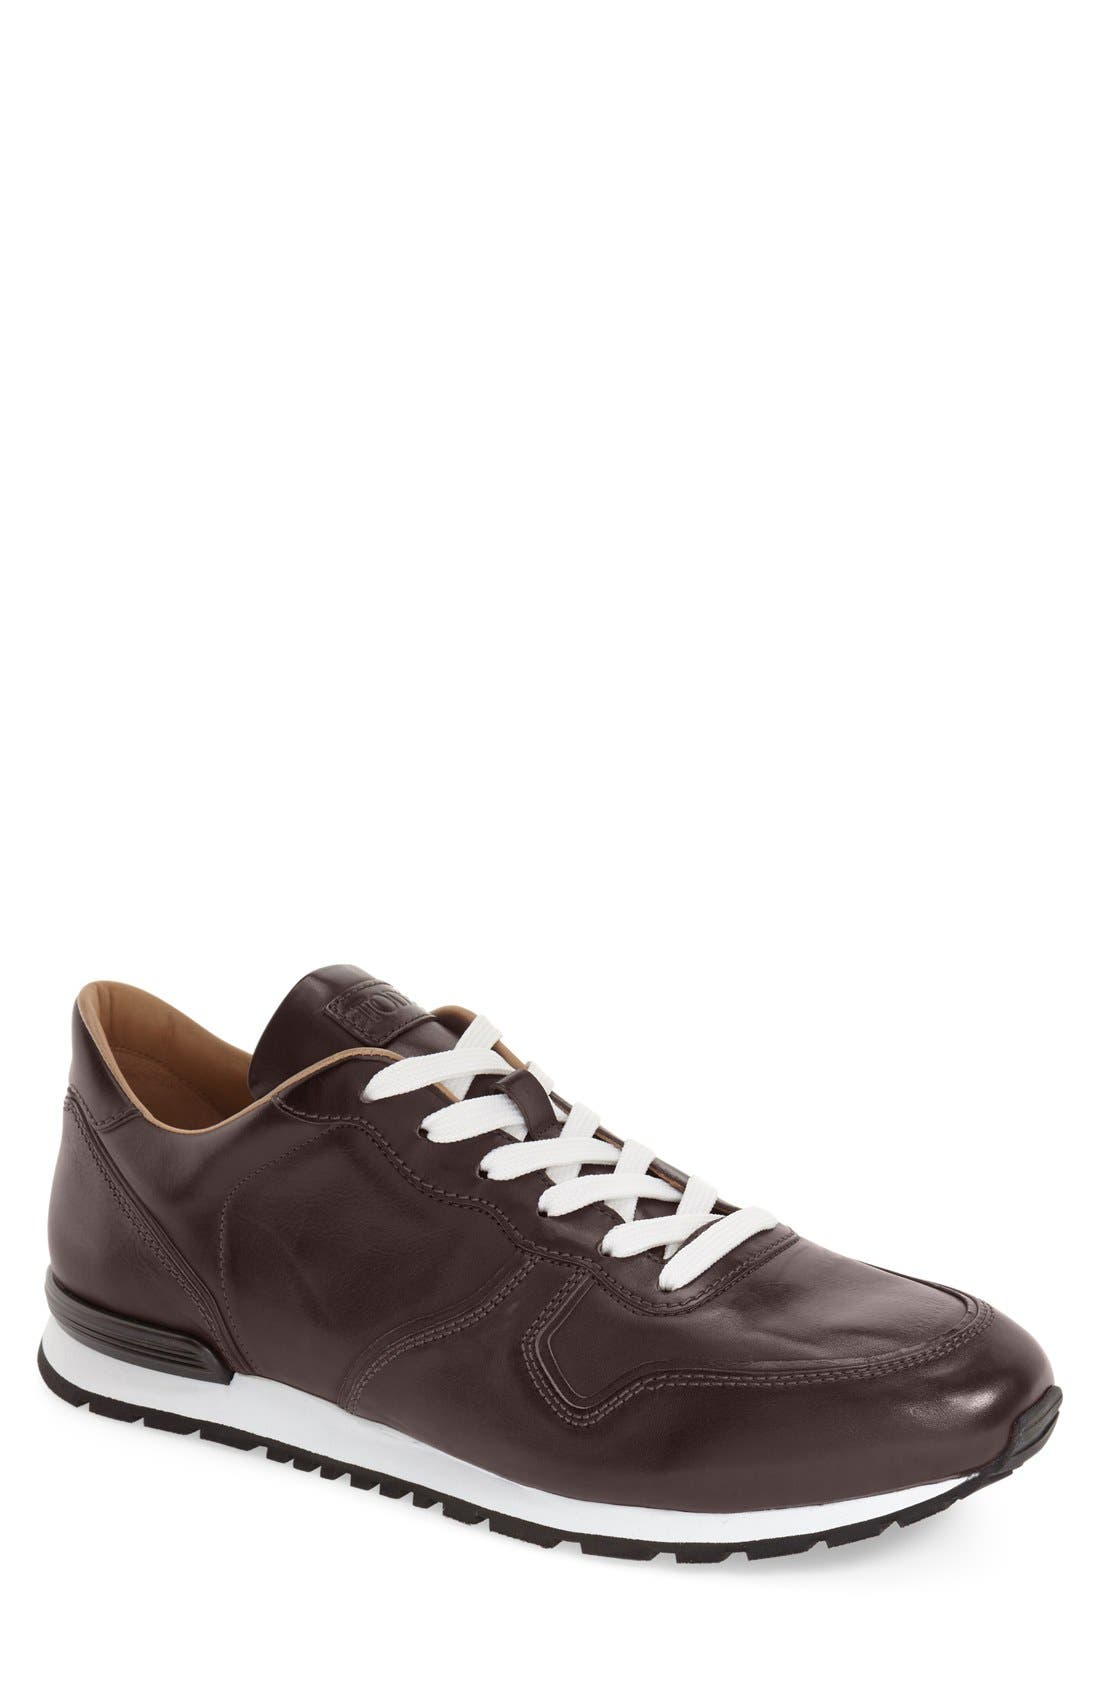 Alternate Image 1 Selected - Tod's 'Allacciato' Sneaker (Men)